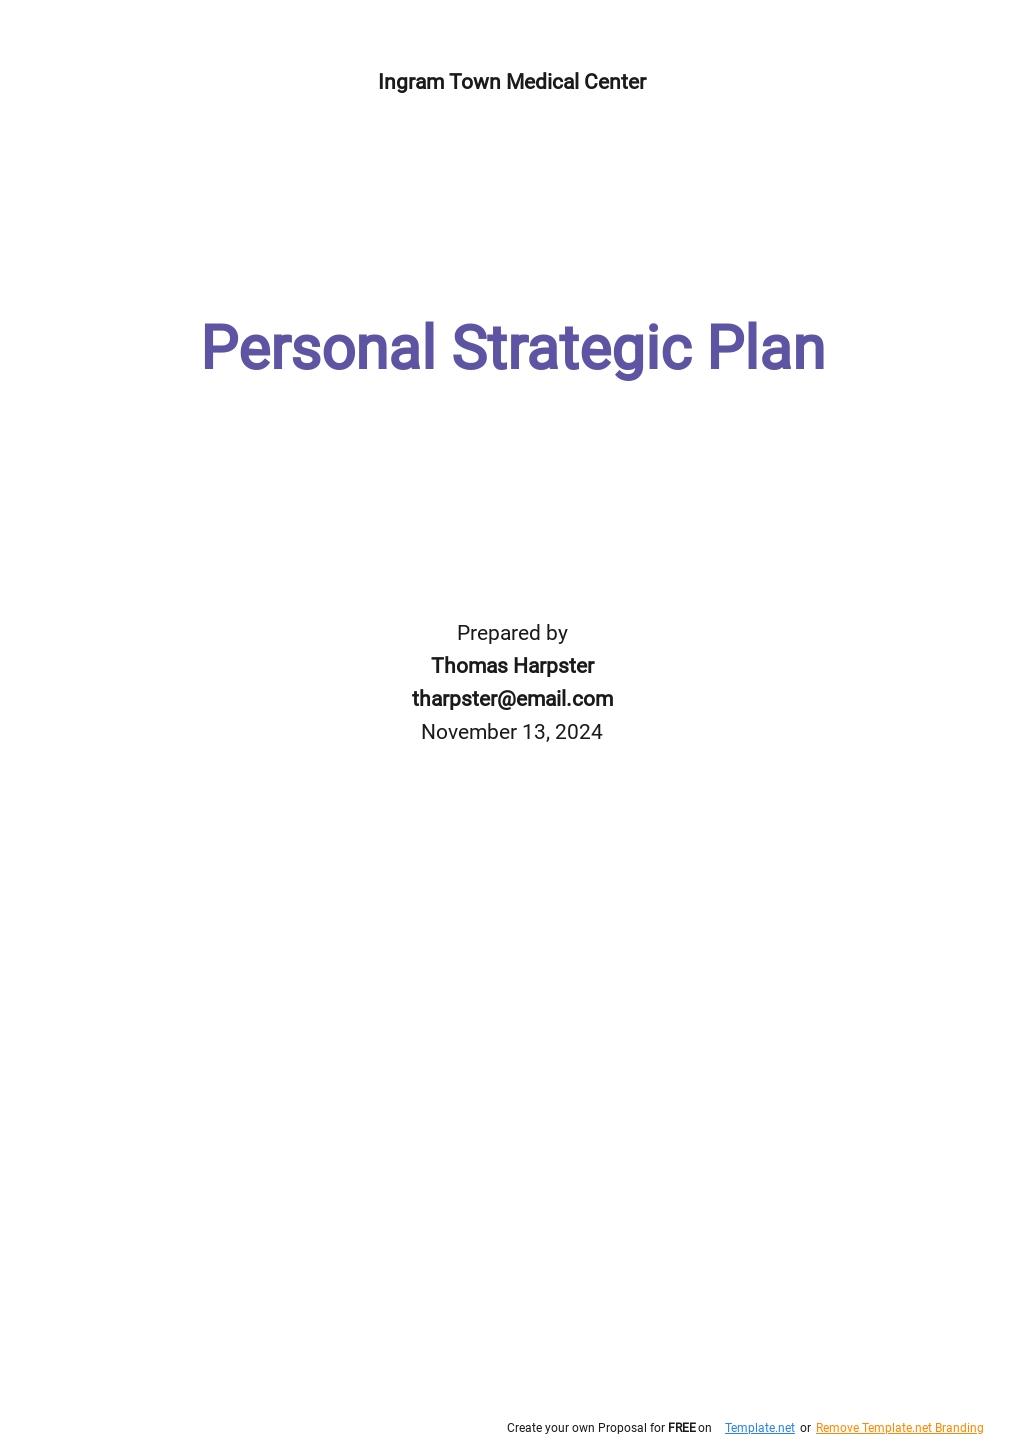 Personal Strategic Plan Template.jpe